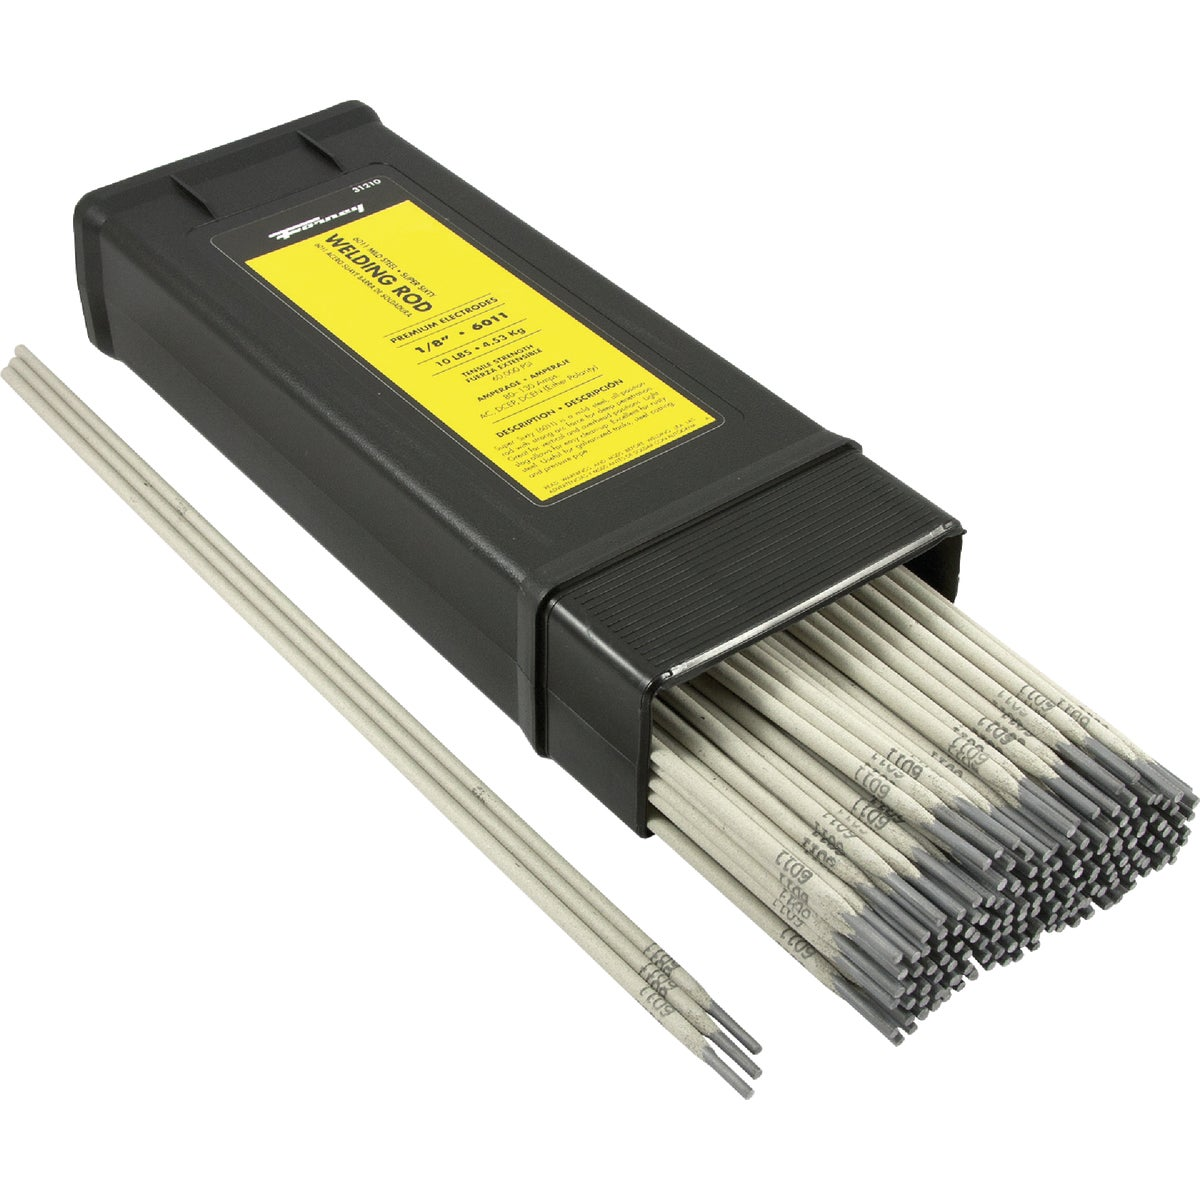 10LB 6011 ELECTRODE